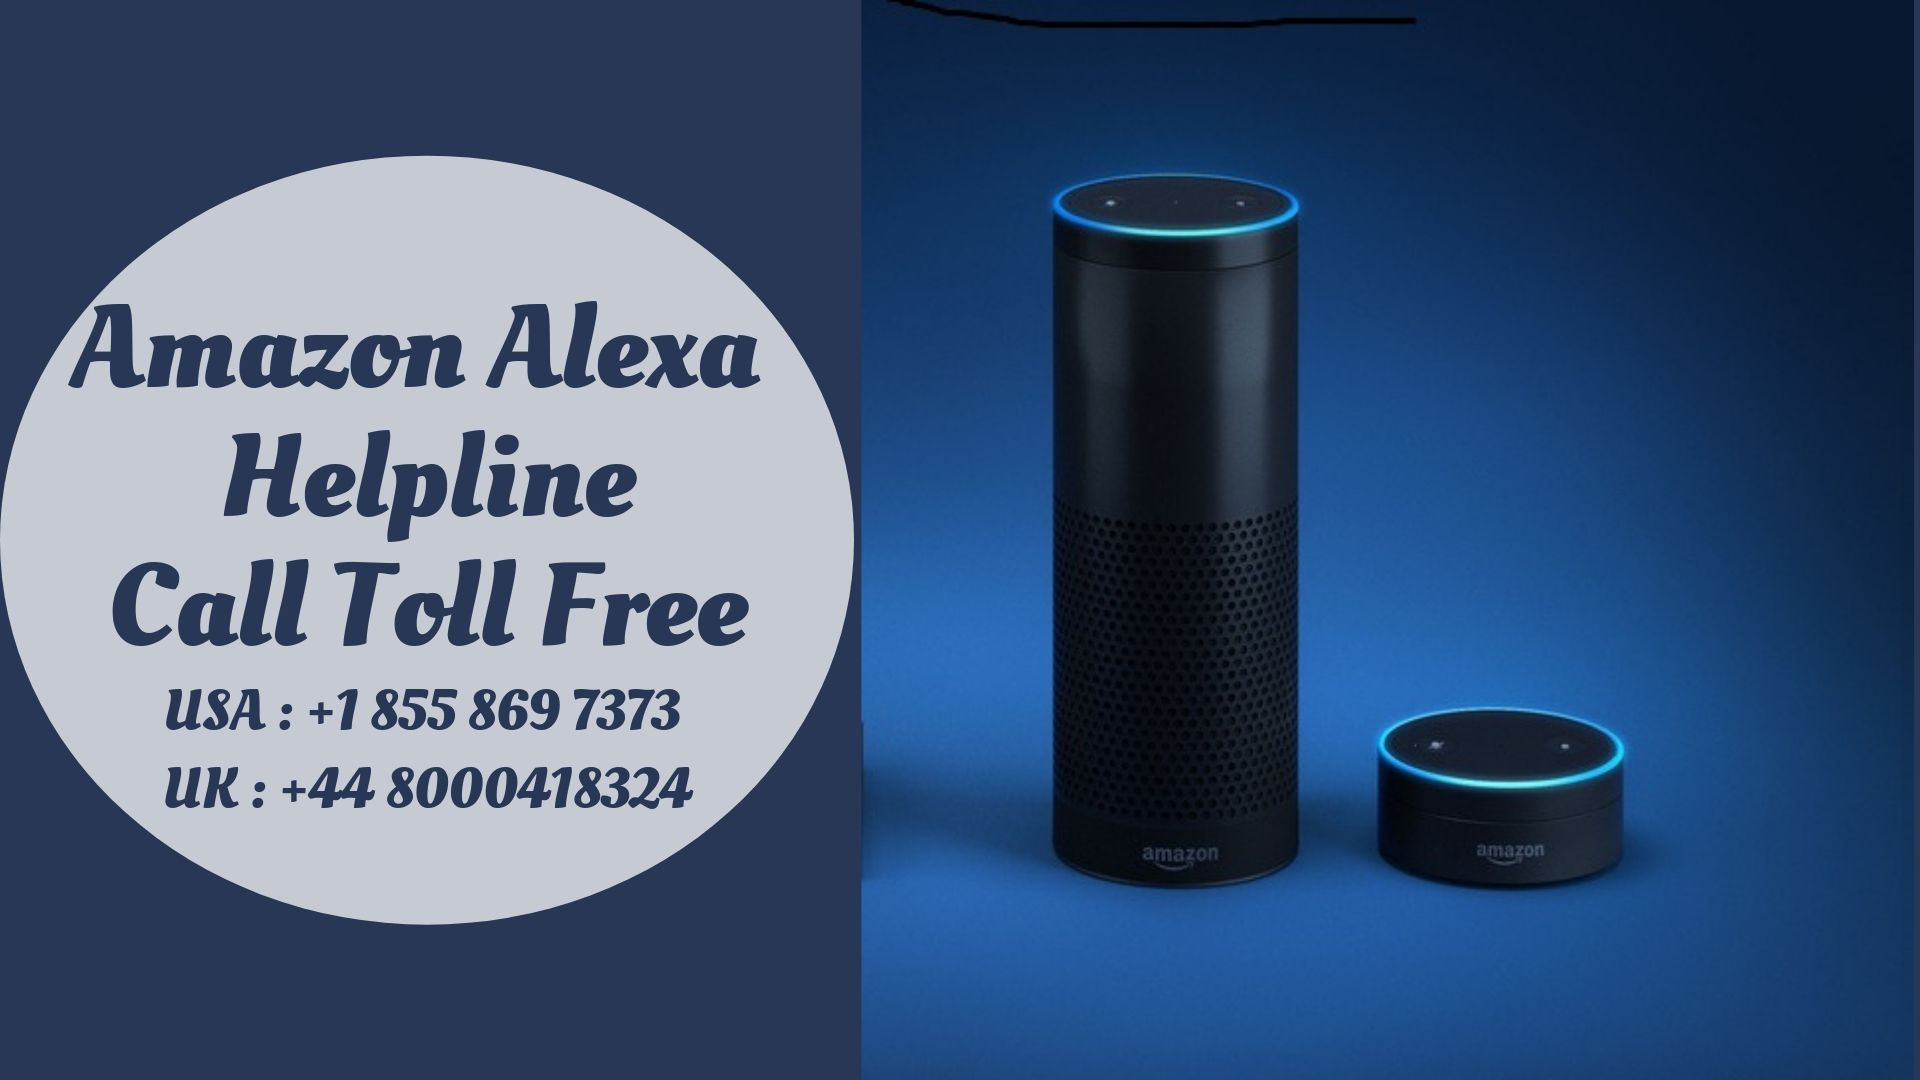 Need To Experience Really Good Connectivity Of Your Amazon Alexa